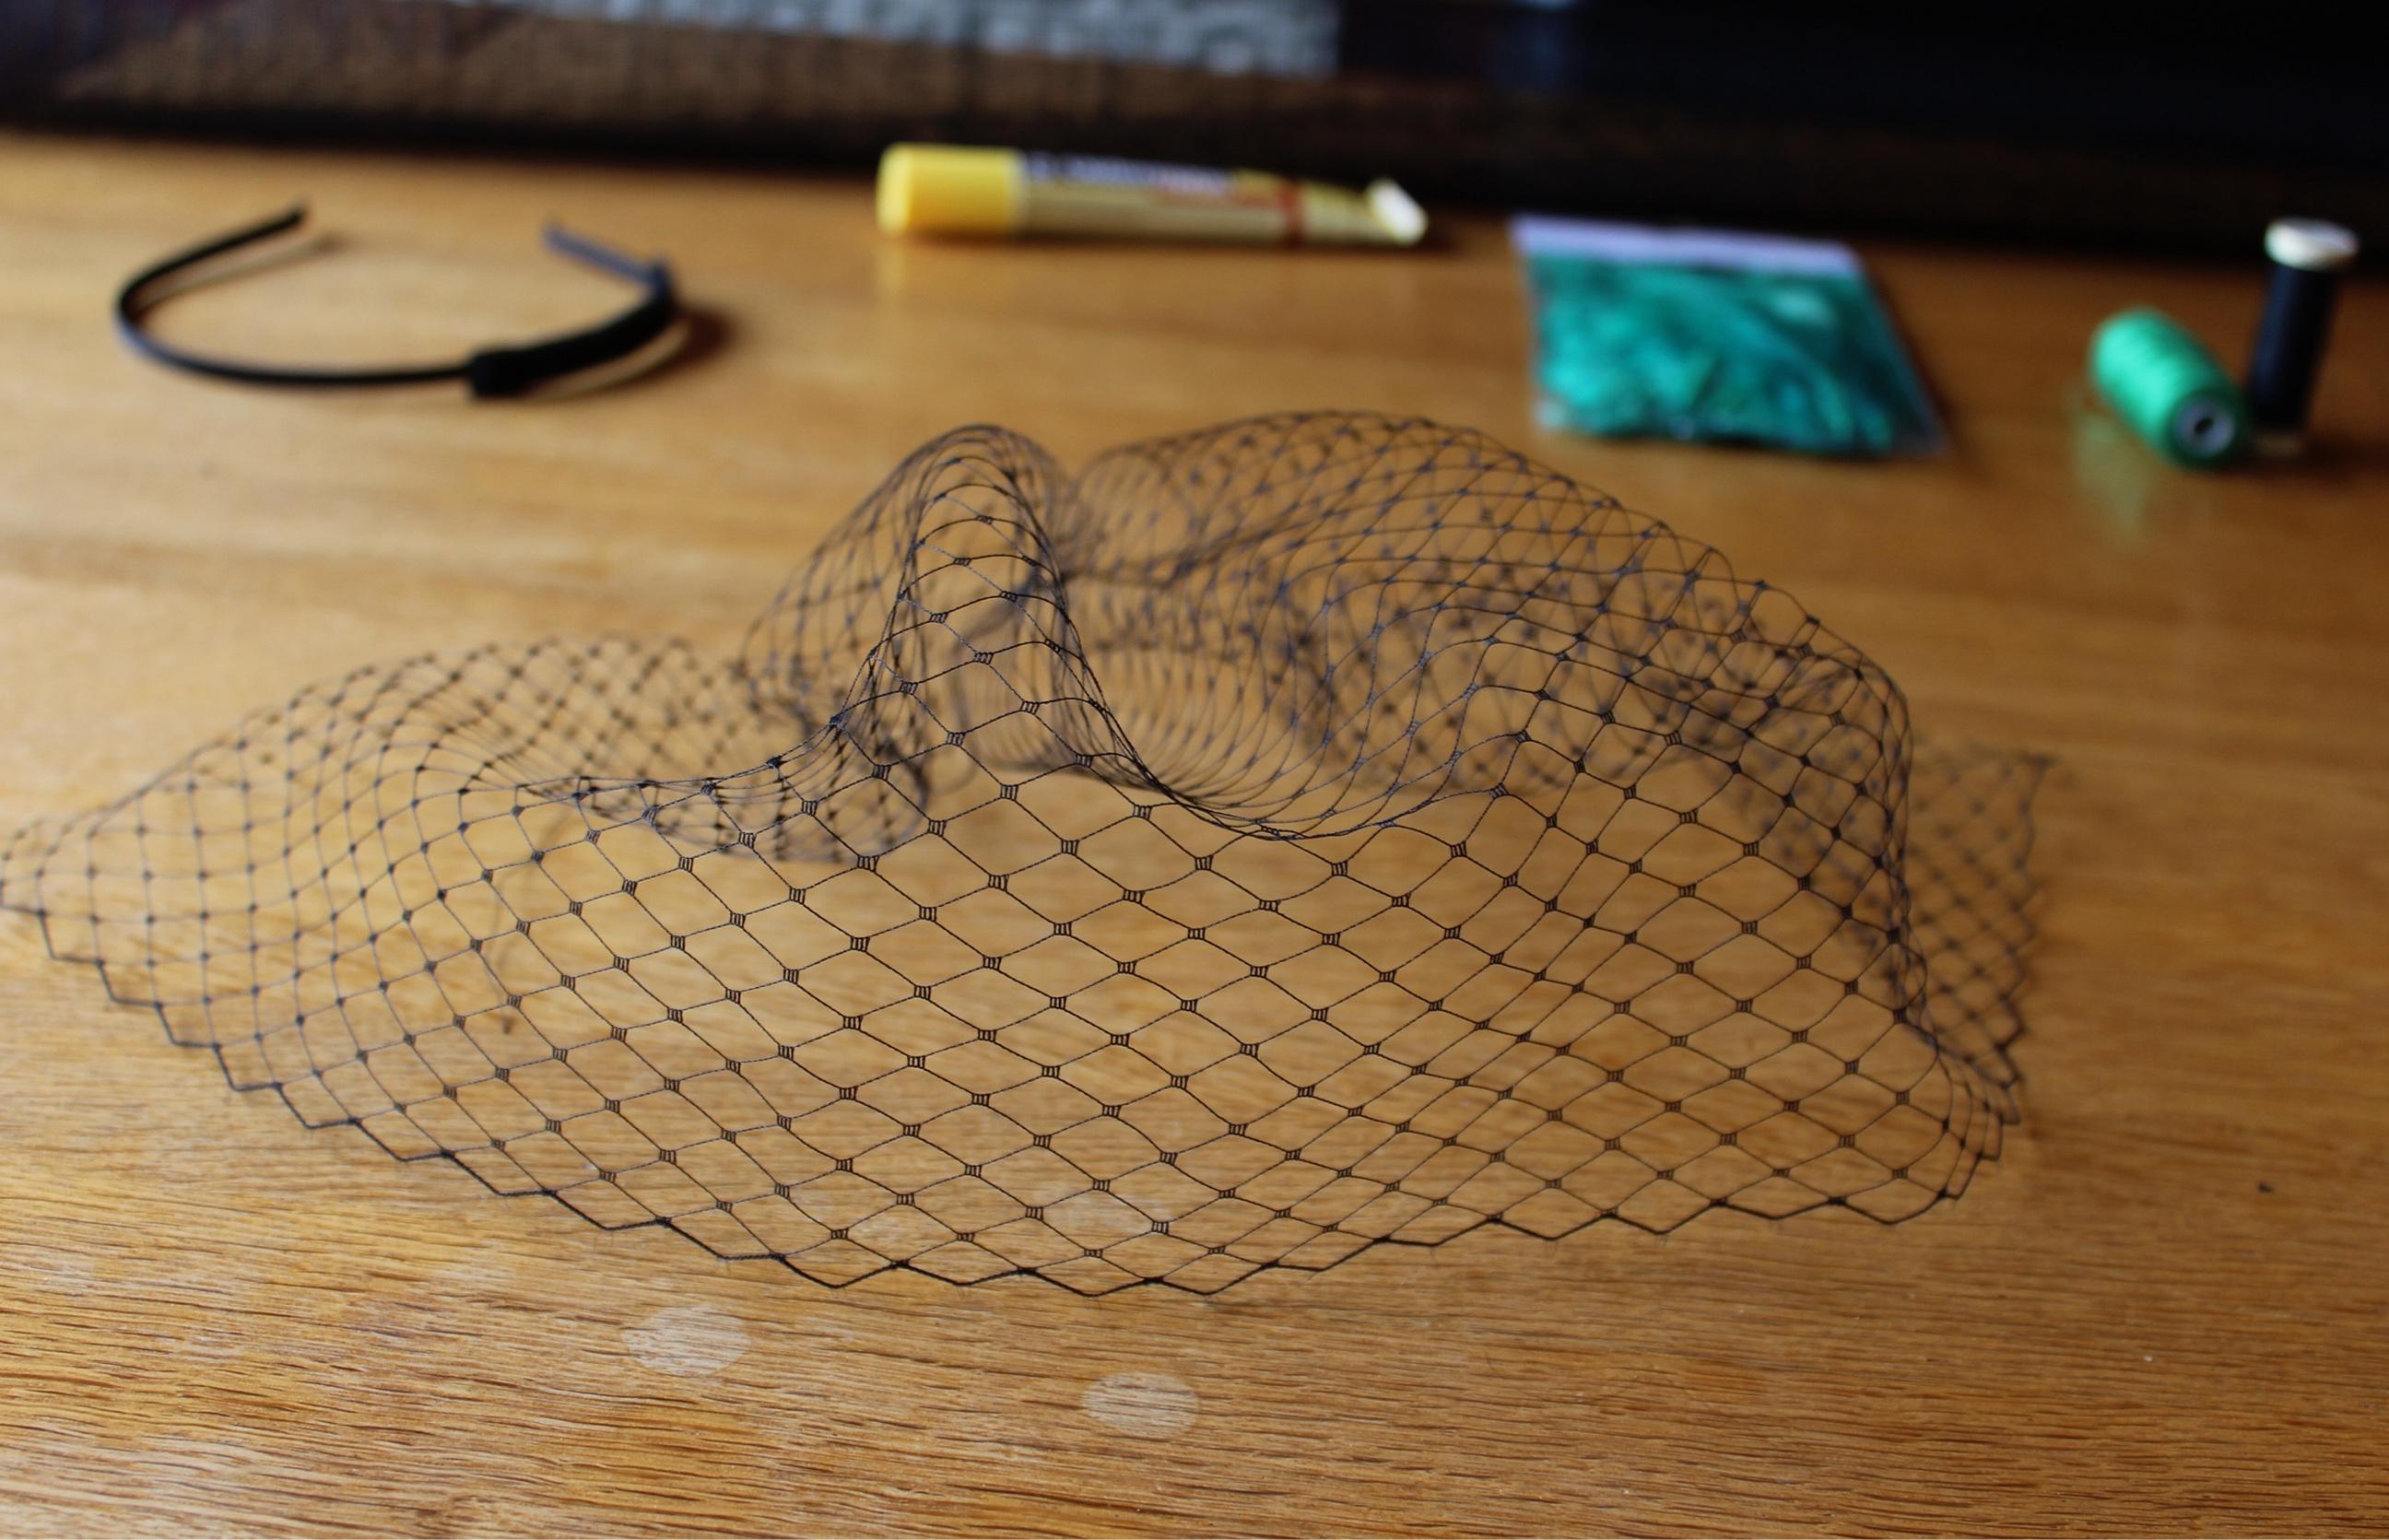 Diy fascinator tutorial diy fascinator birdcage feathers tutorial solutioingenieria Images